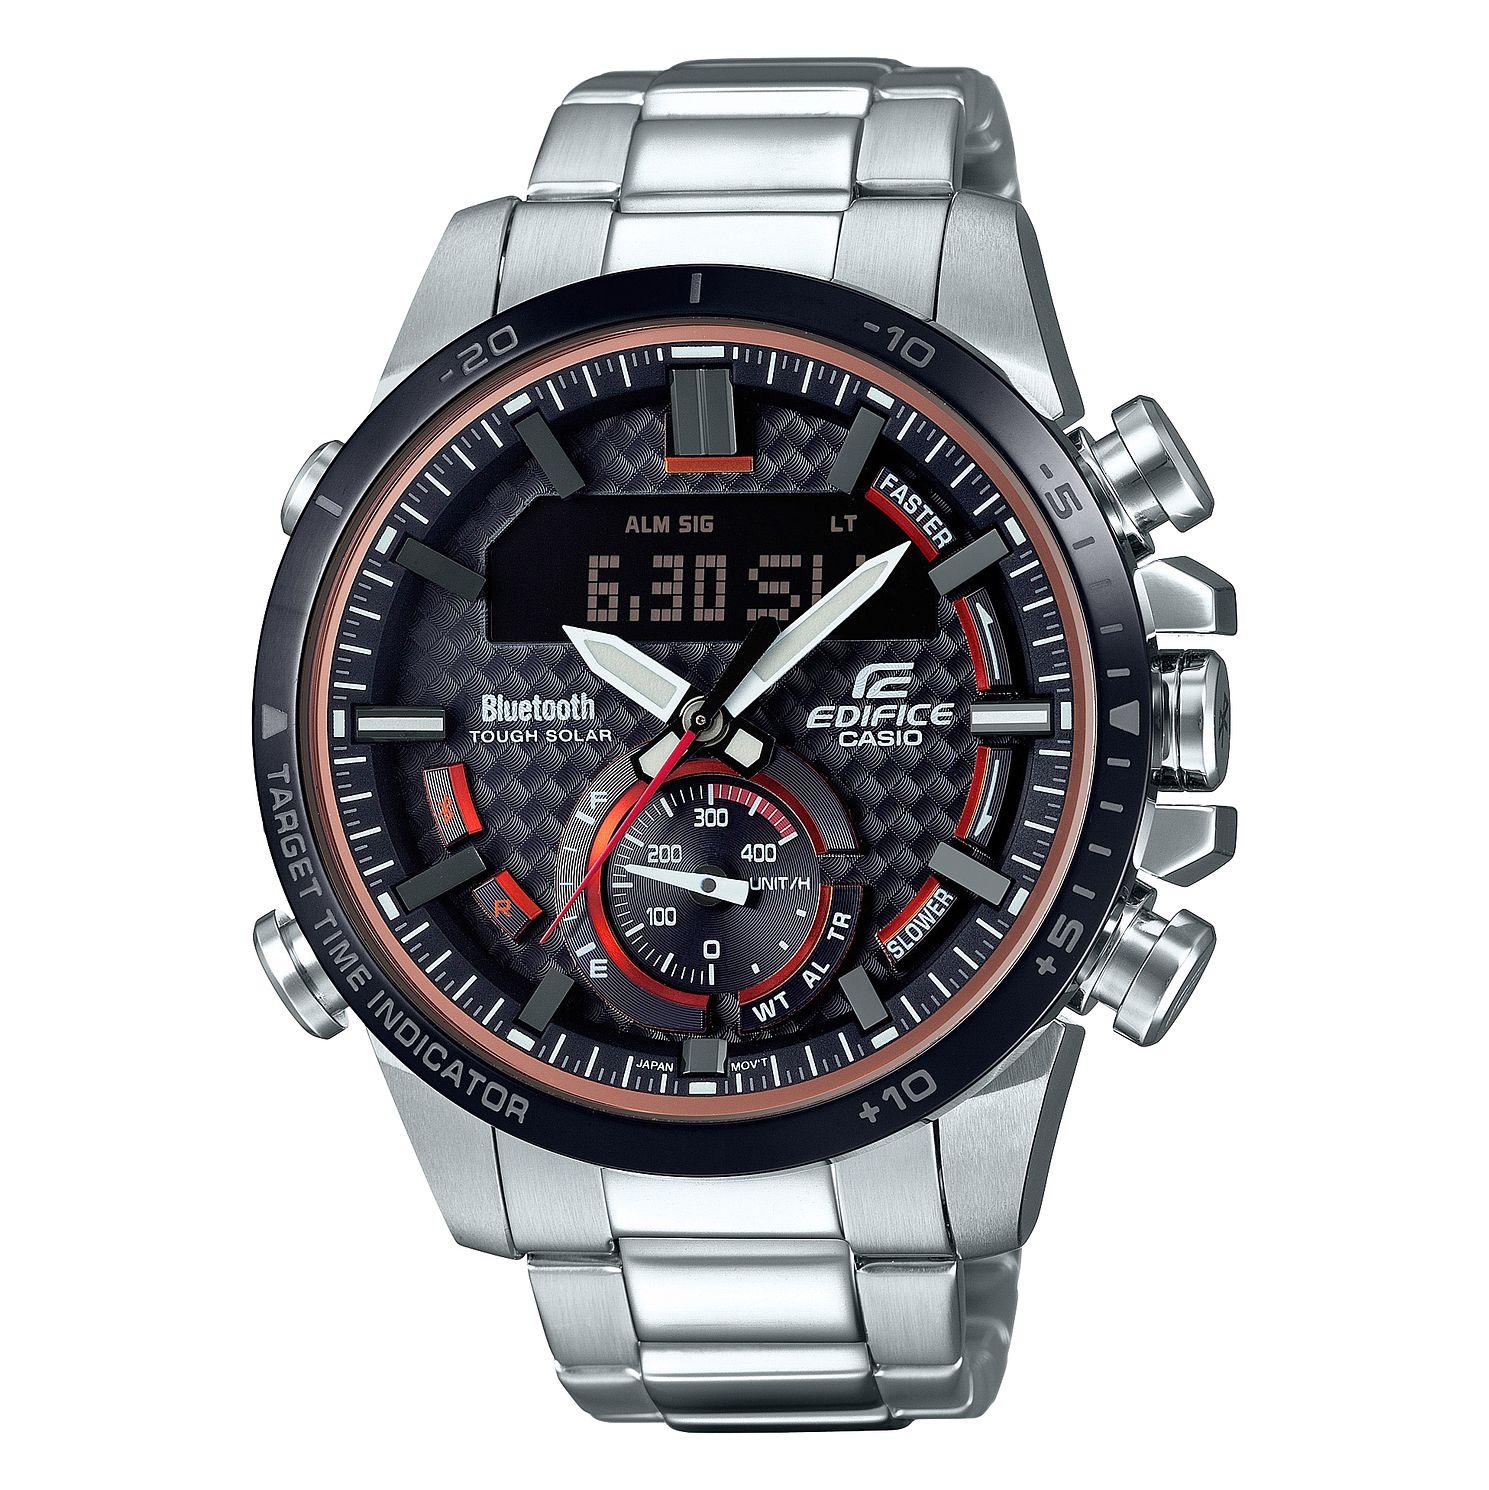 Casio Edifice Men's Bluetooth Solar Powered Bracelet Watch £155 @ Ernest Jones